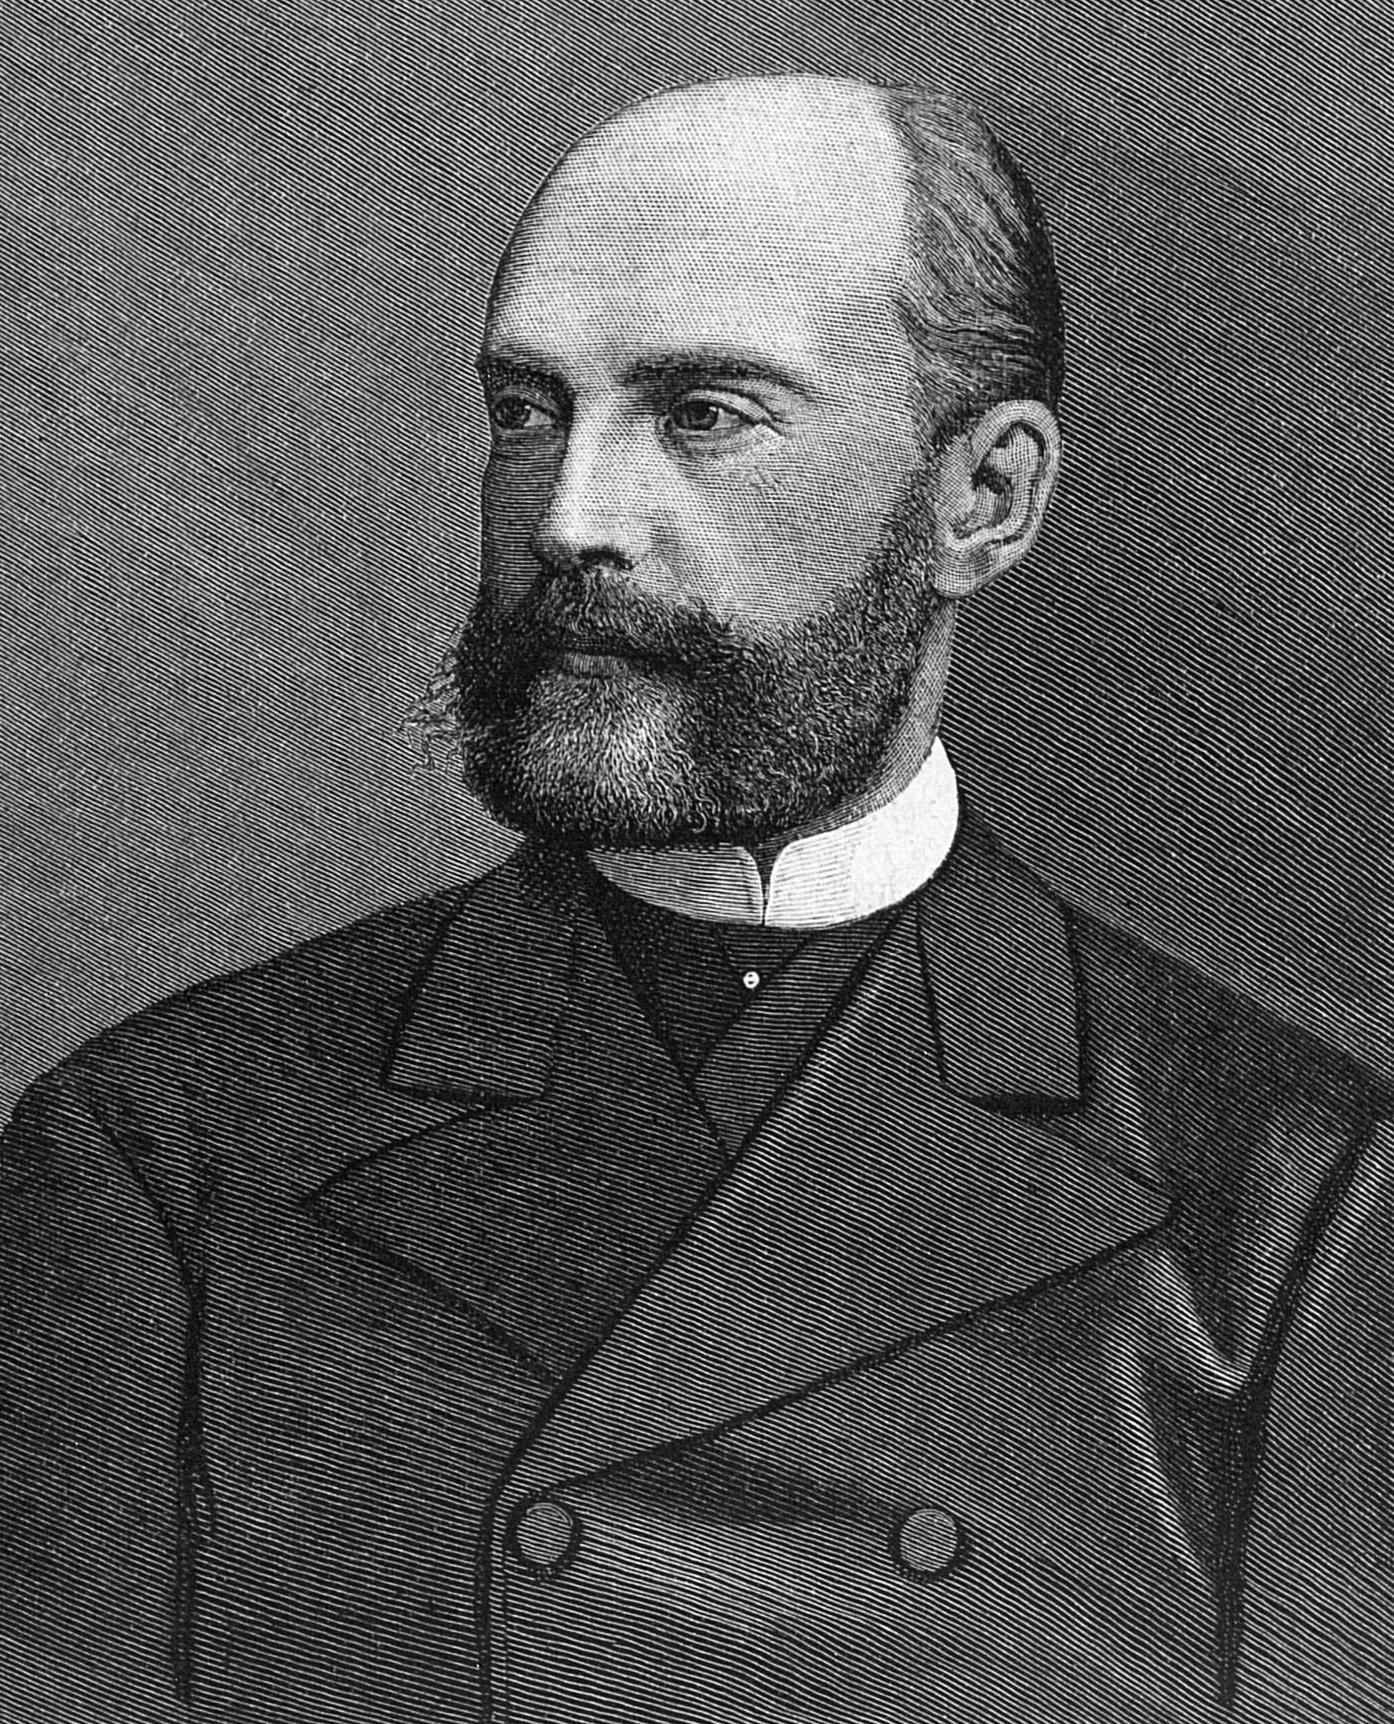 Константин Случевский (1837 - 1904)